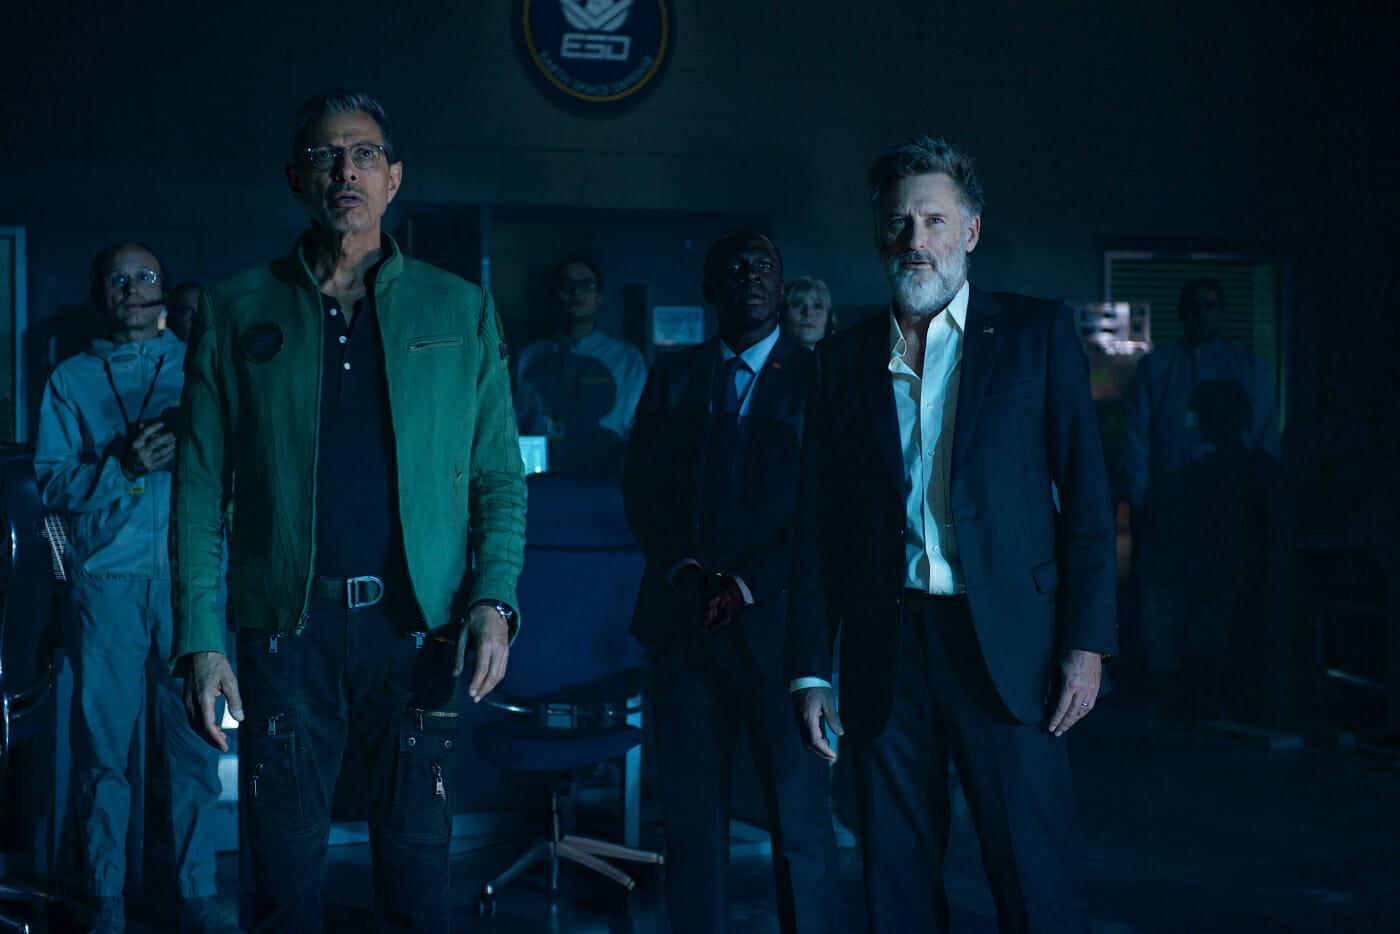 Independence-Day-2-resurgence-Goldblum-Pullman